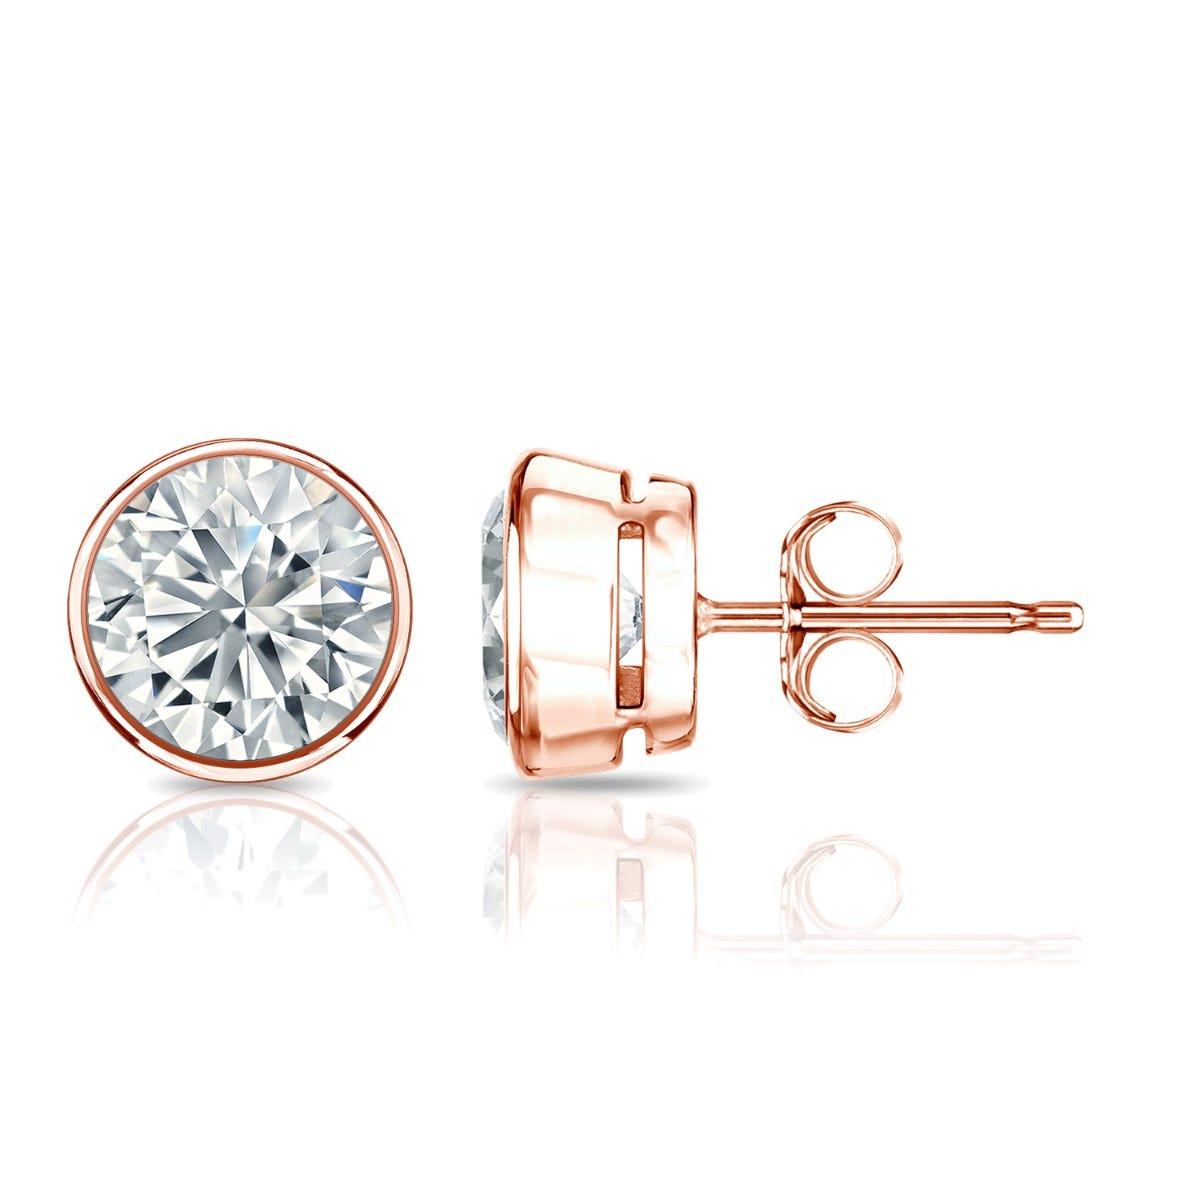 Diamond Round Bezel-Set 1-1/2ctw. Solitaire Stud (IJ-SI1) Earrings in 14K Rose Gold